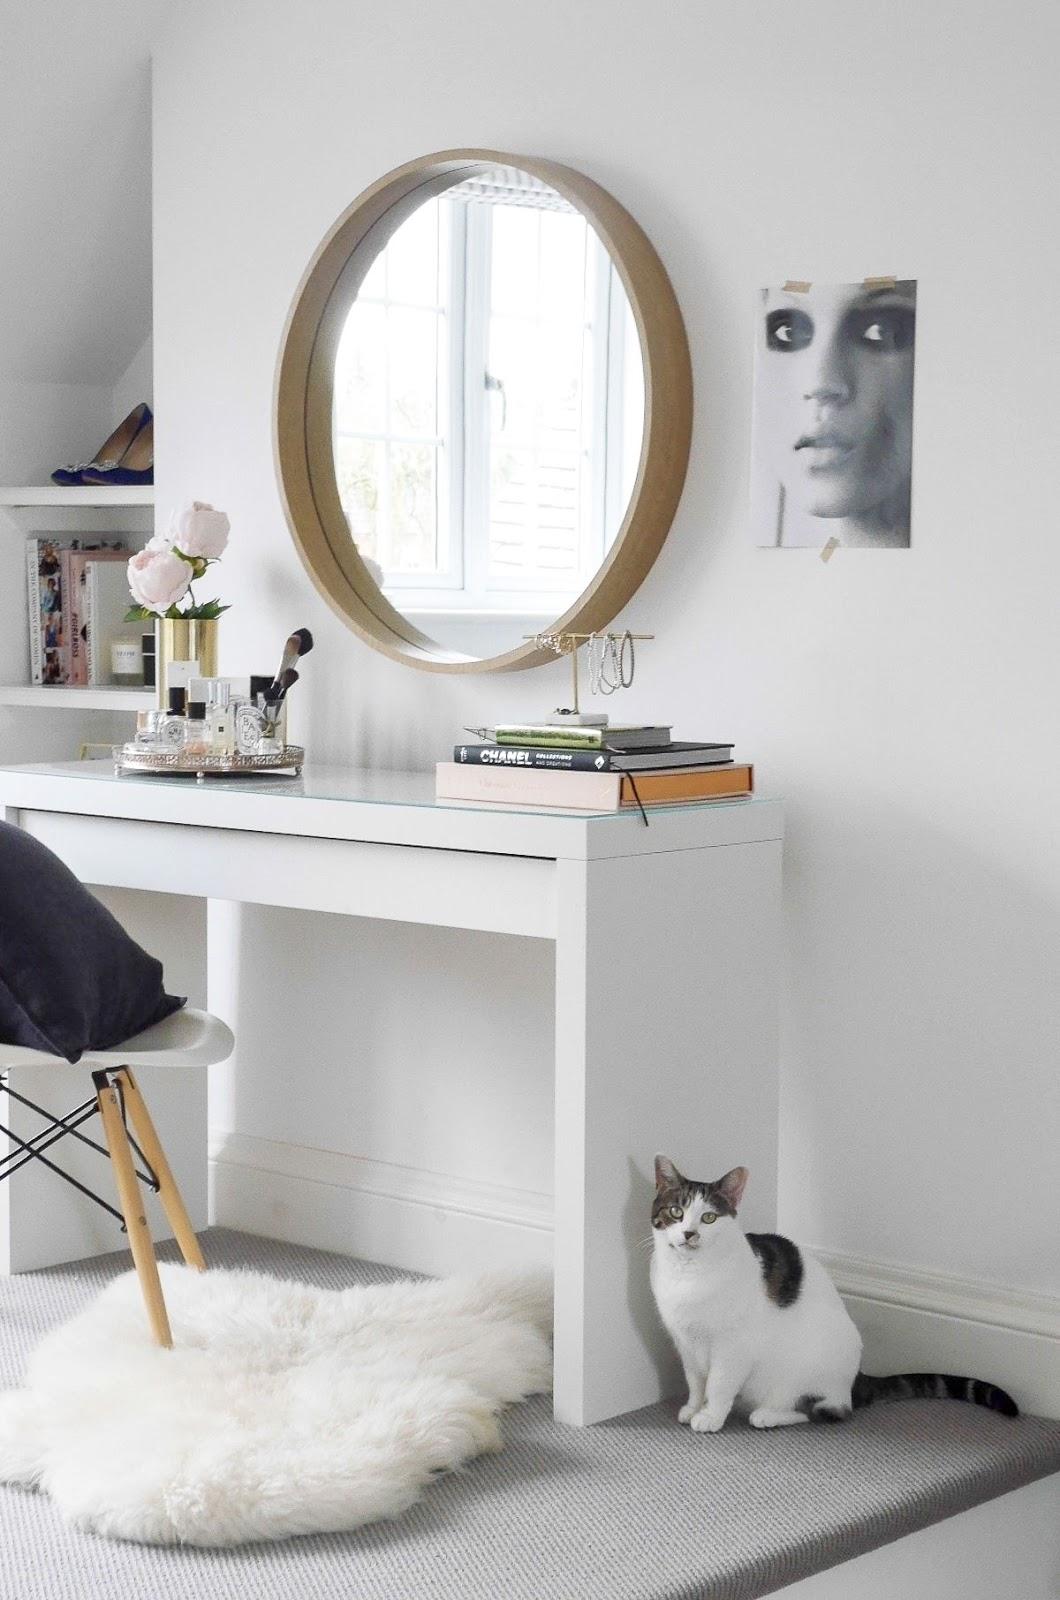 10 Ways To Decorate With Round Mirror